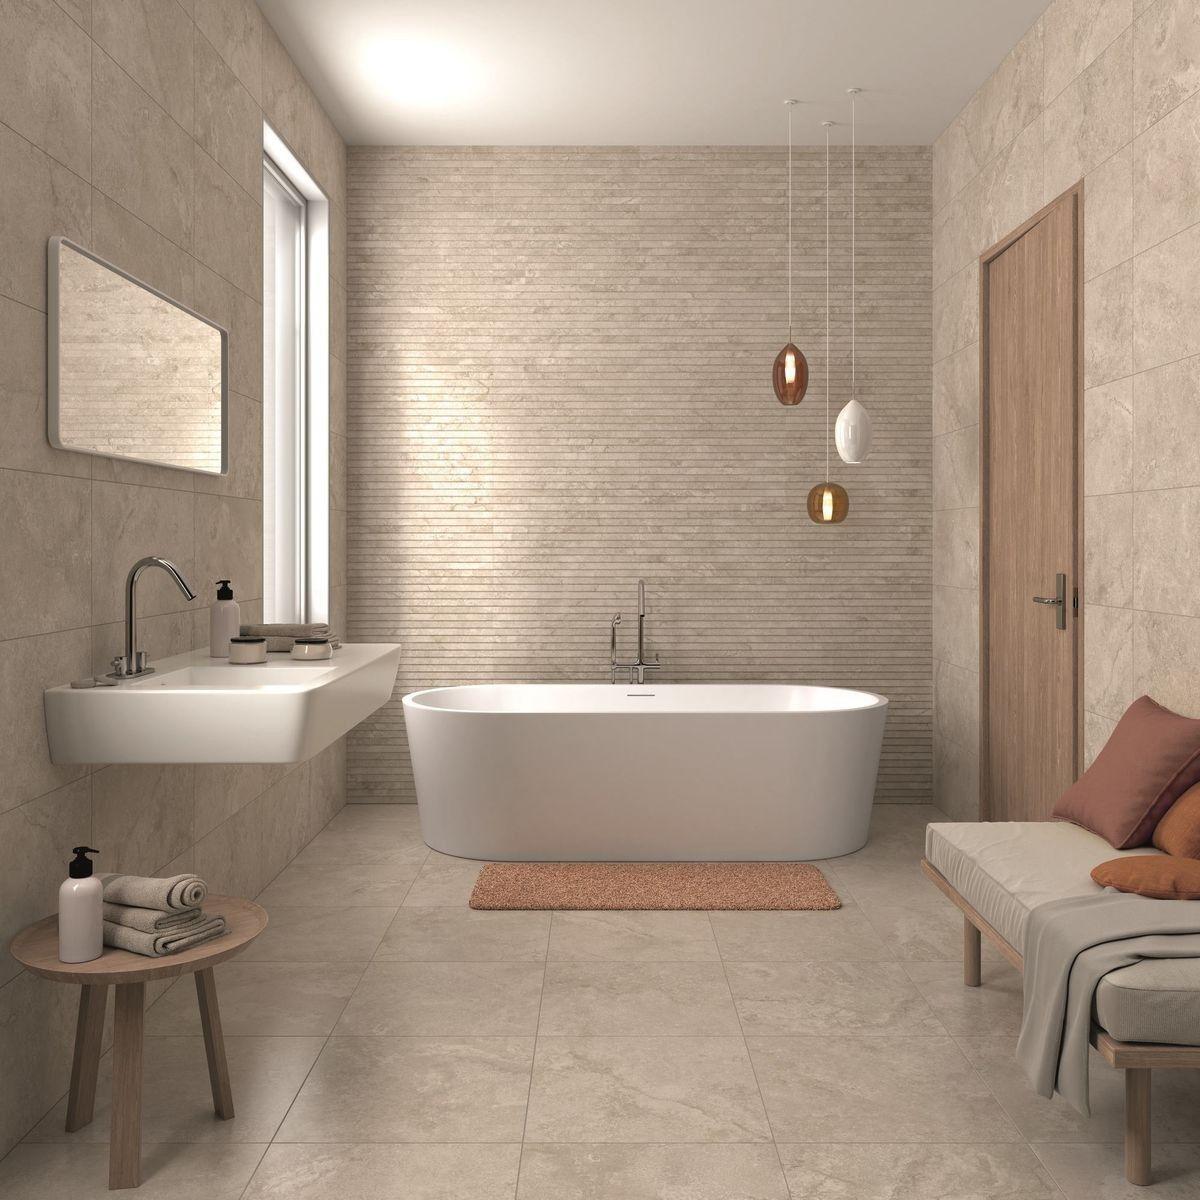 Beige Bathroom Ideas For Feeling Bright And Homey Bathroom Feature Wall Beige Tile Bathroom Brown Tile Bathroom